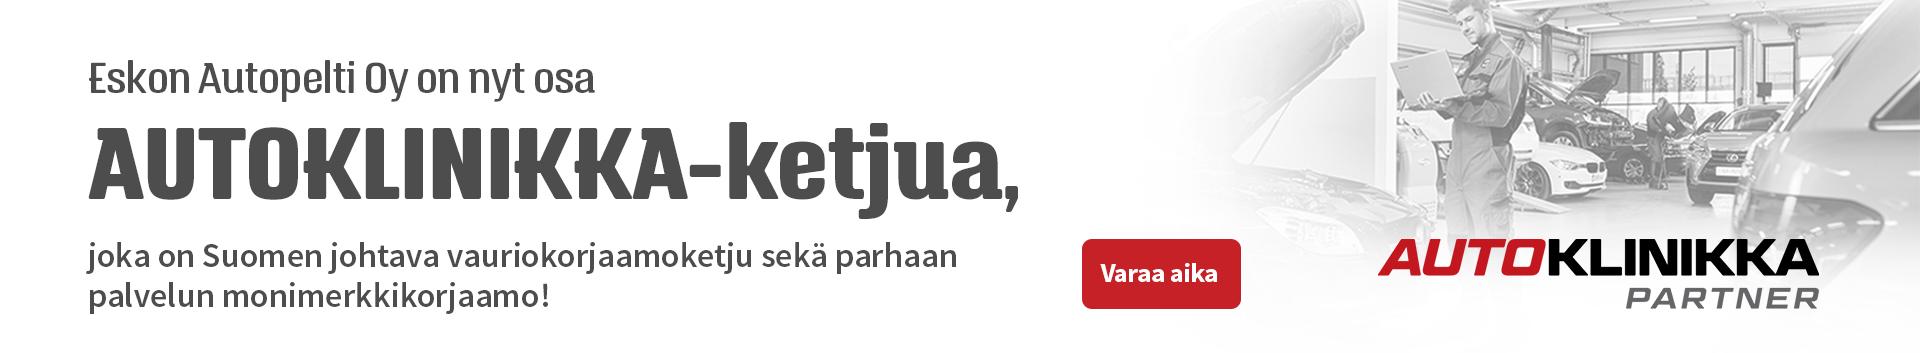 Eskon-Autopelti-Oy_banneri_1920x353px